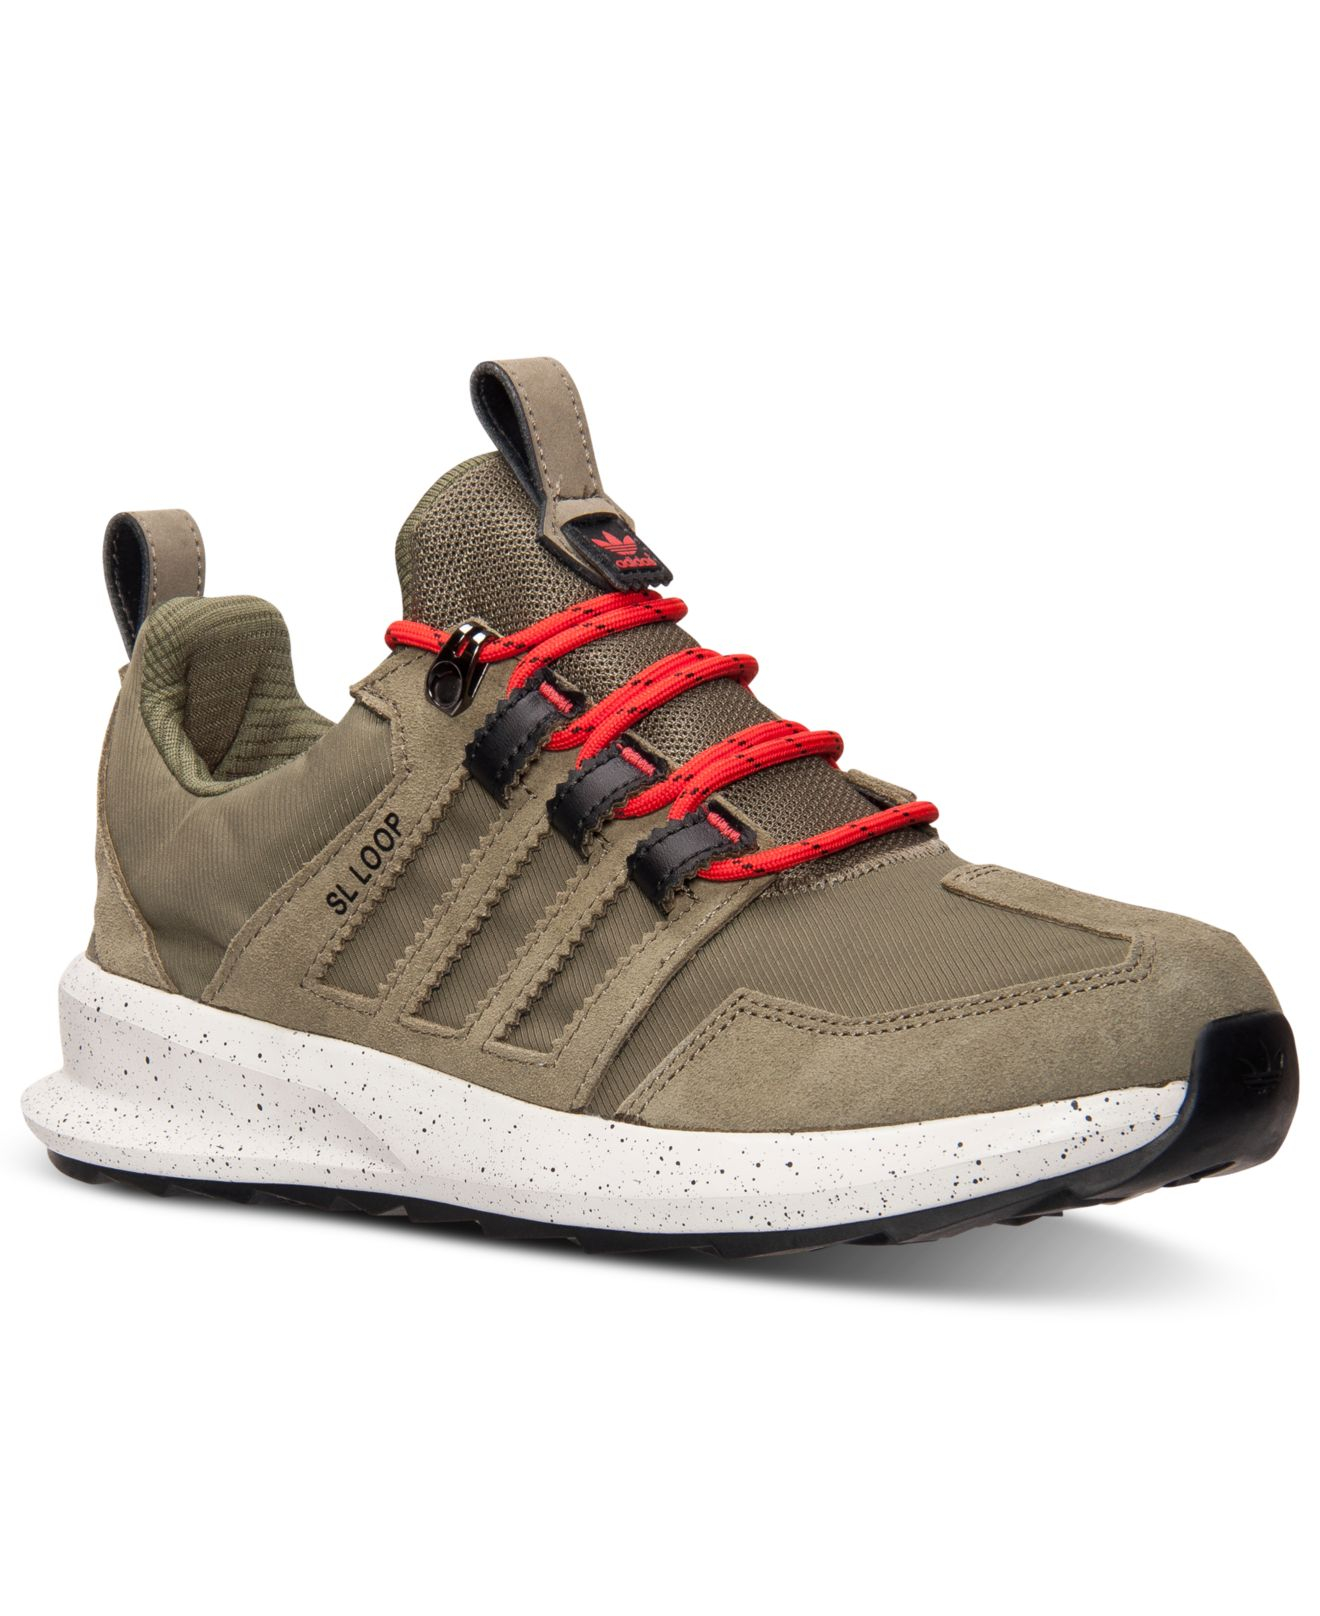 pretty nice e2d10 c096a Lyst - adidas Originals Men s Sl Loop Trail Runner Casual Sneakers ...